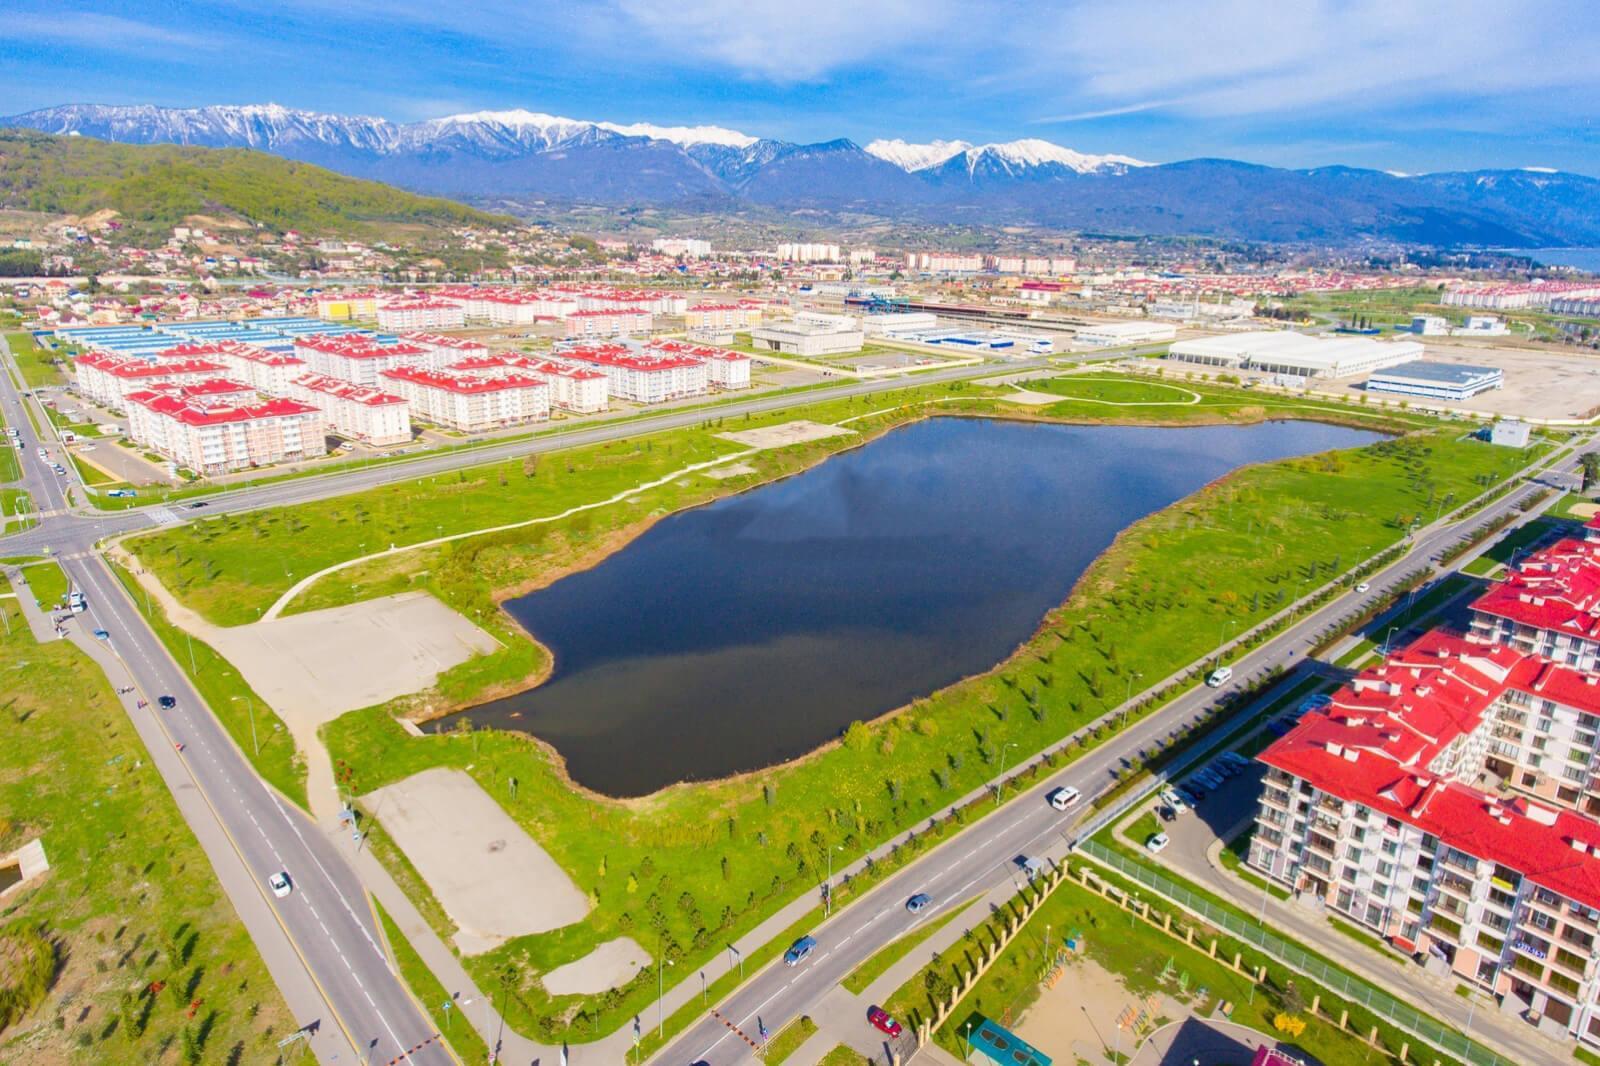 Гостиничный комплекс в Олимпийском парке - image Gostinichnyj-kompleks-v-Olimpijskom-parke on http://bizneskvartal.ru